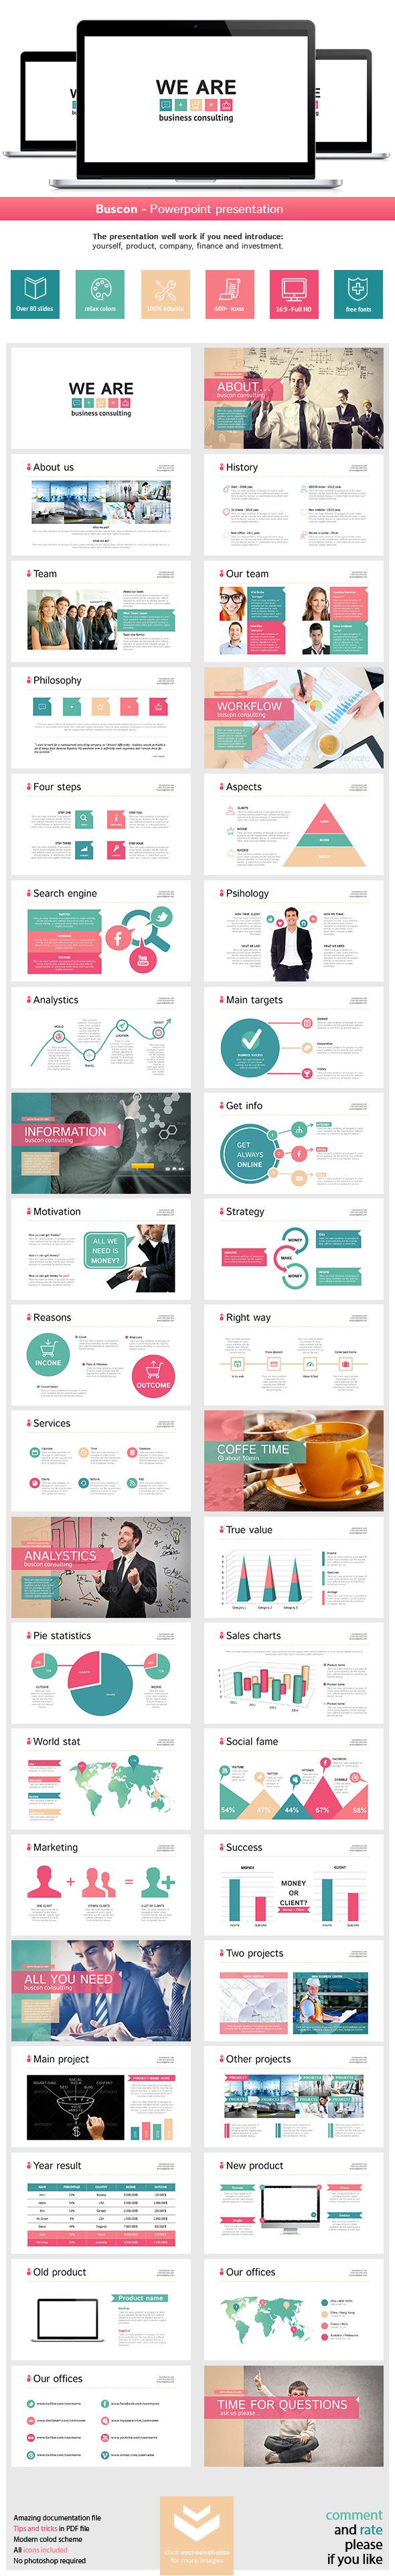 Marketing plan powerpoint template presentation design and infographics also rh pinterest